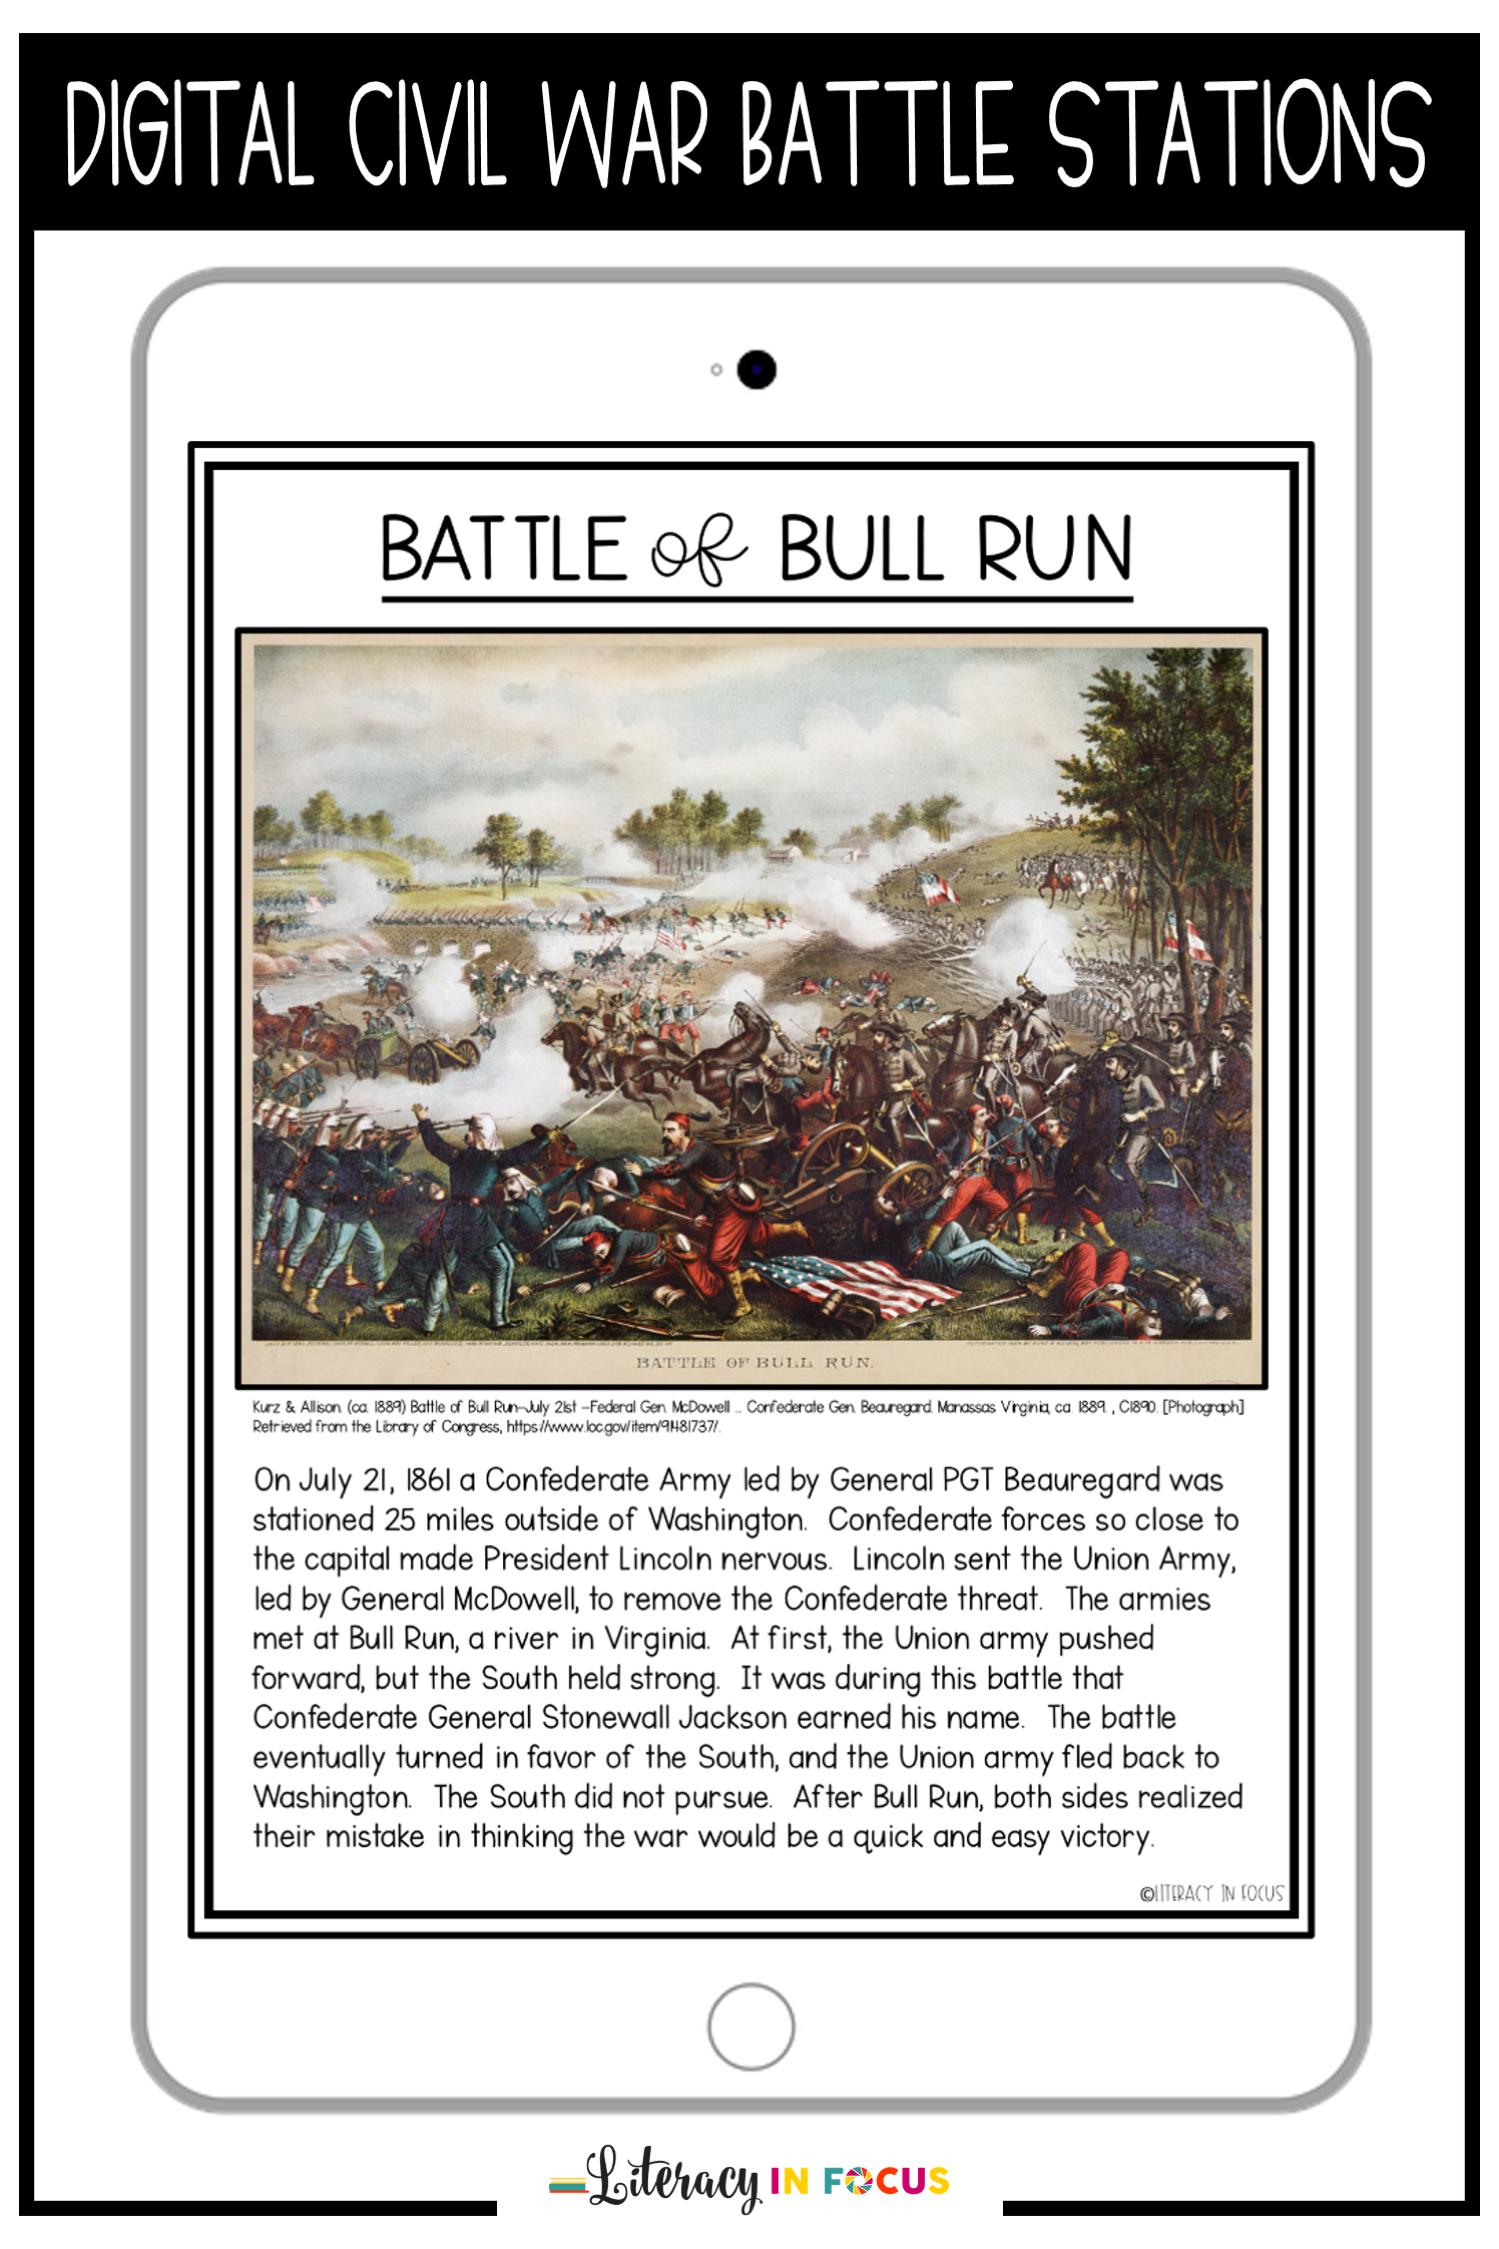 Civil War Battles Activity In